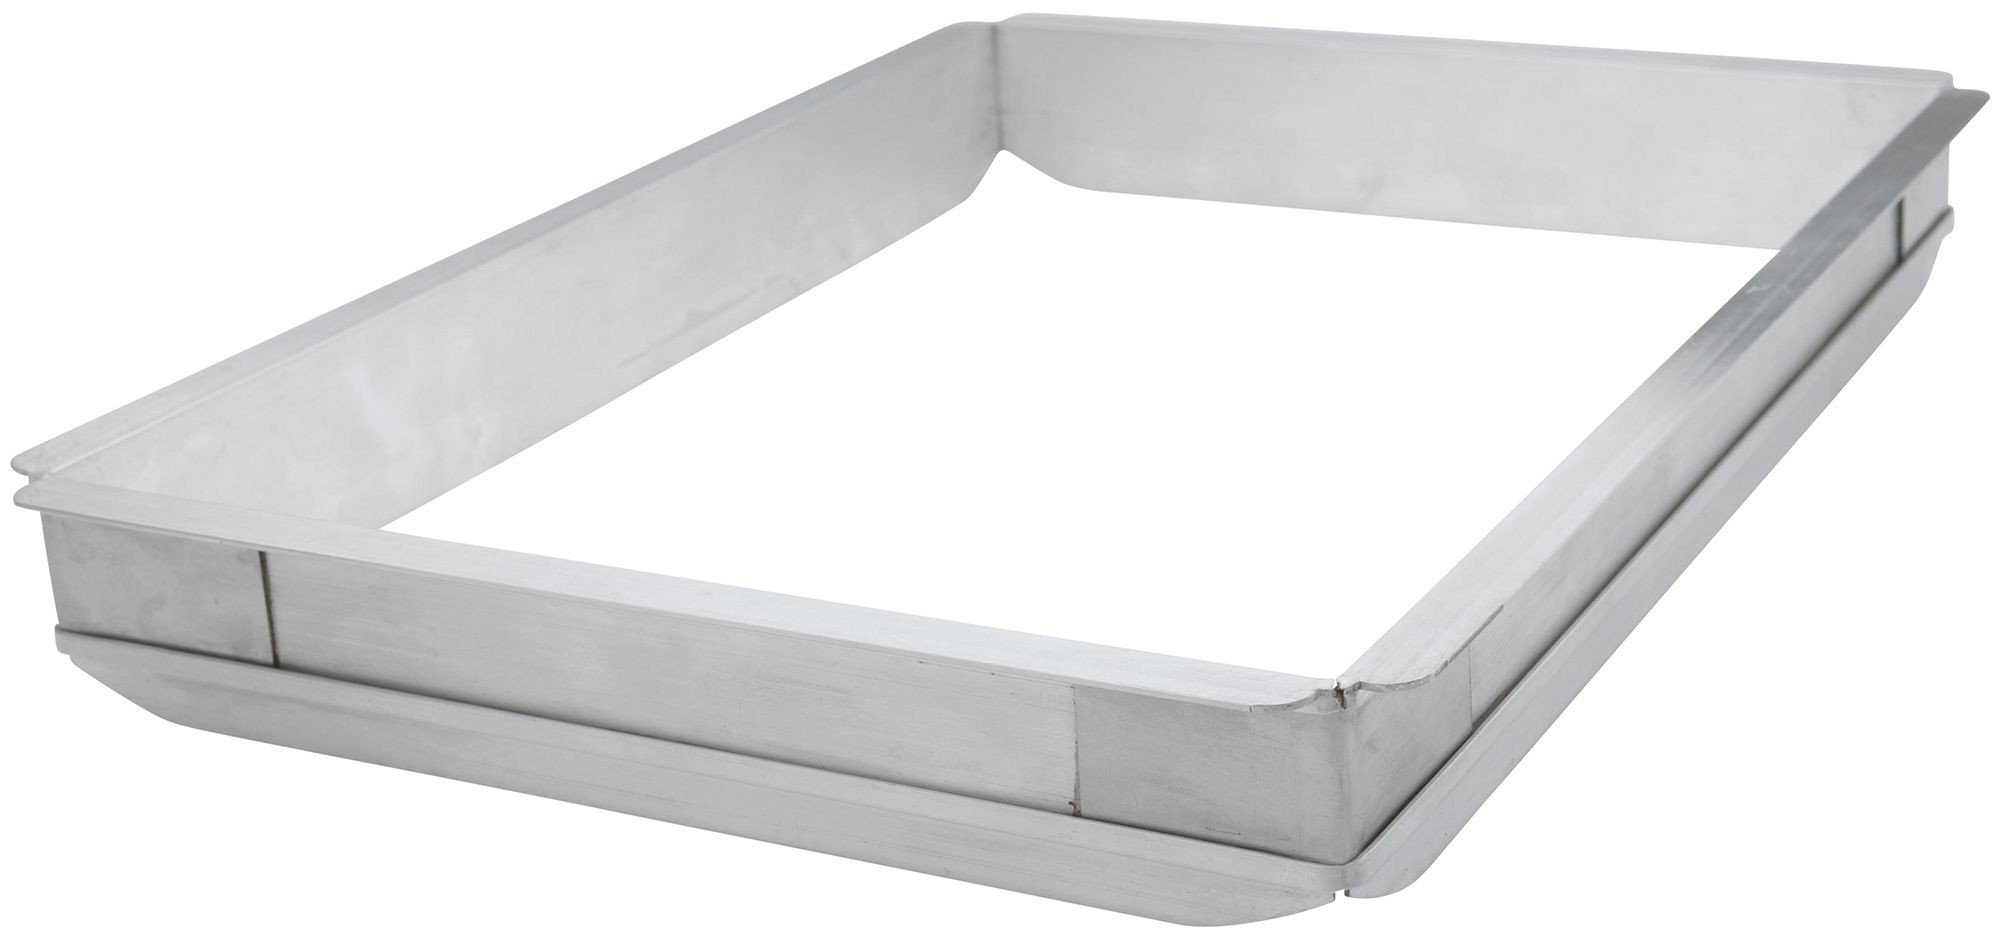 Winco axpe-4 Quarter Size Aluminum Sheet Pan Extender